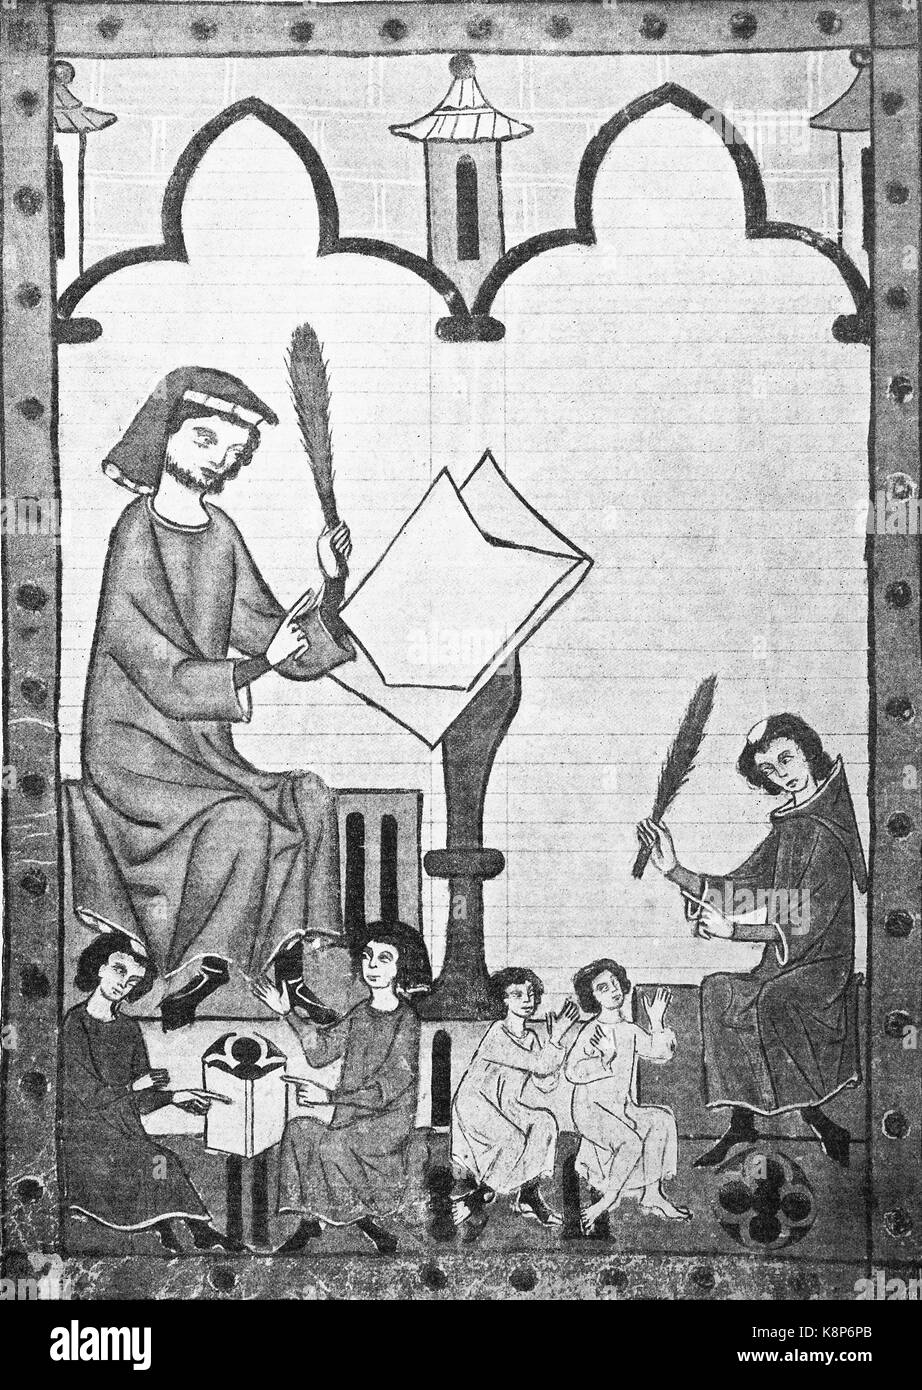 teacher und child in the middle ages from the Codex Manesse, Manesse Codex, or Große Heidelberger Liederhandschrif, Stock Photo